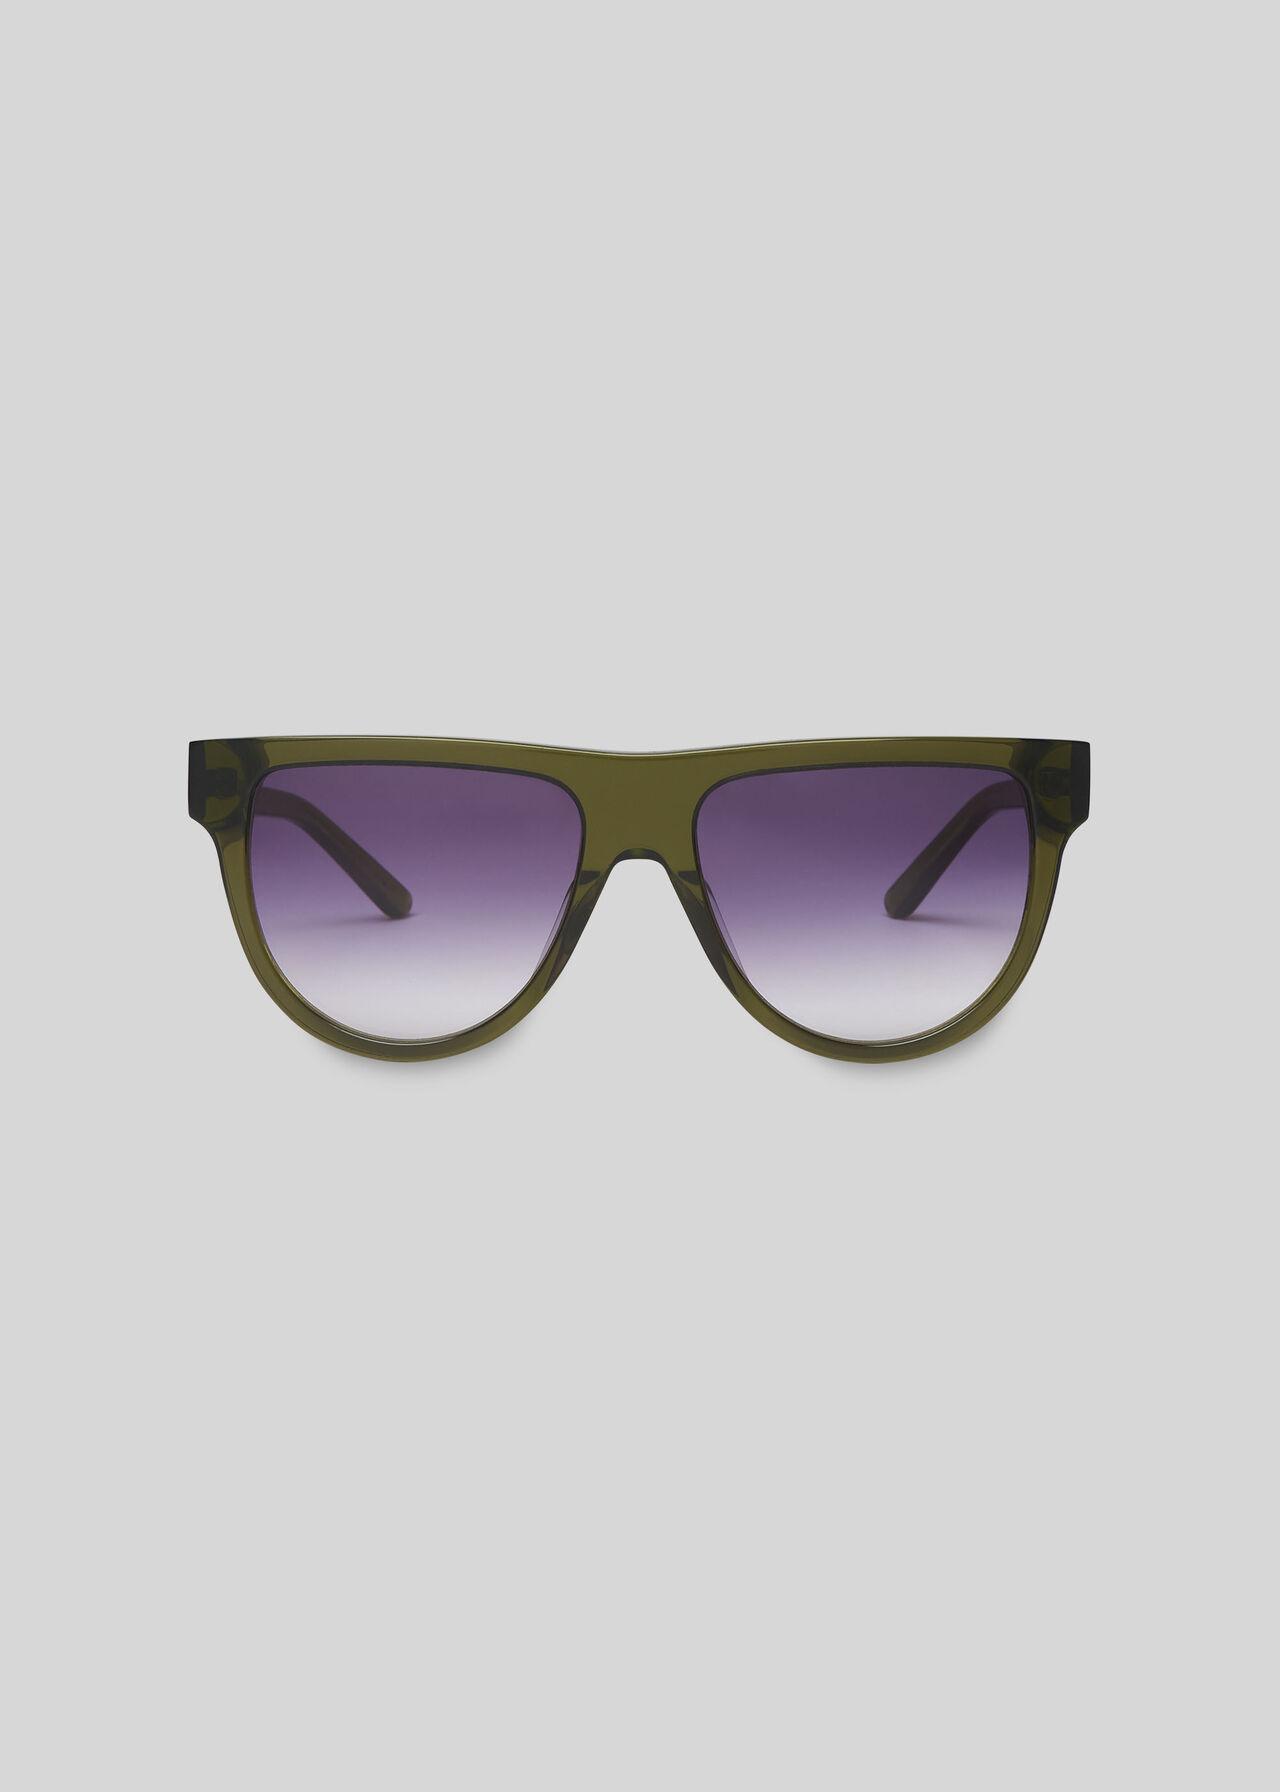 Elia Aviator Sunglasses Green